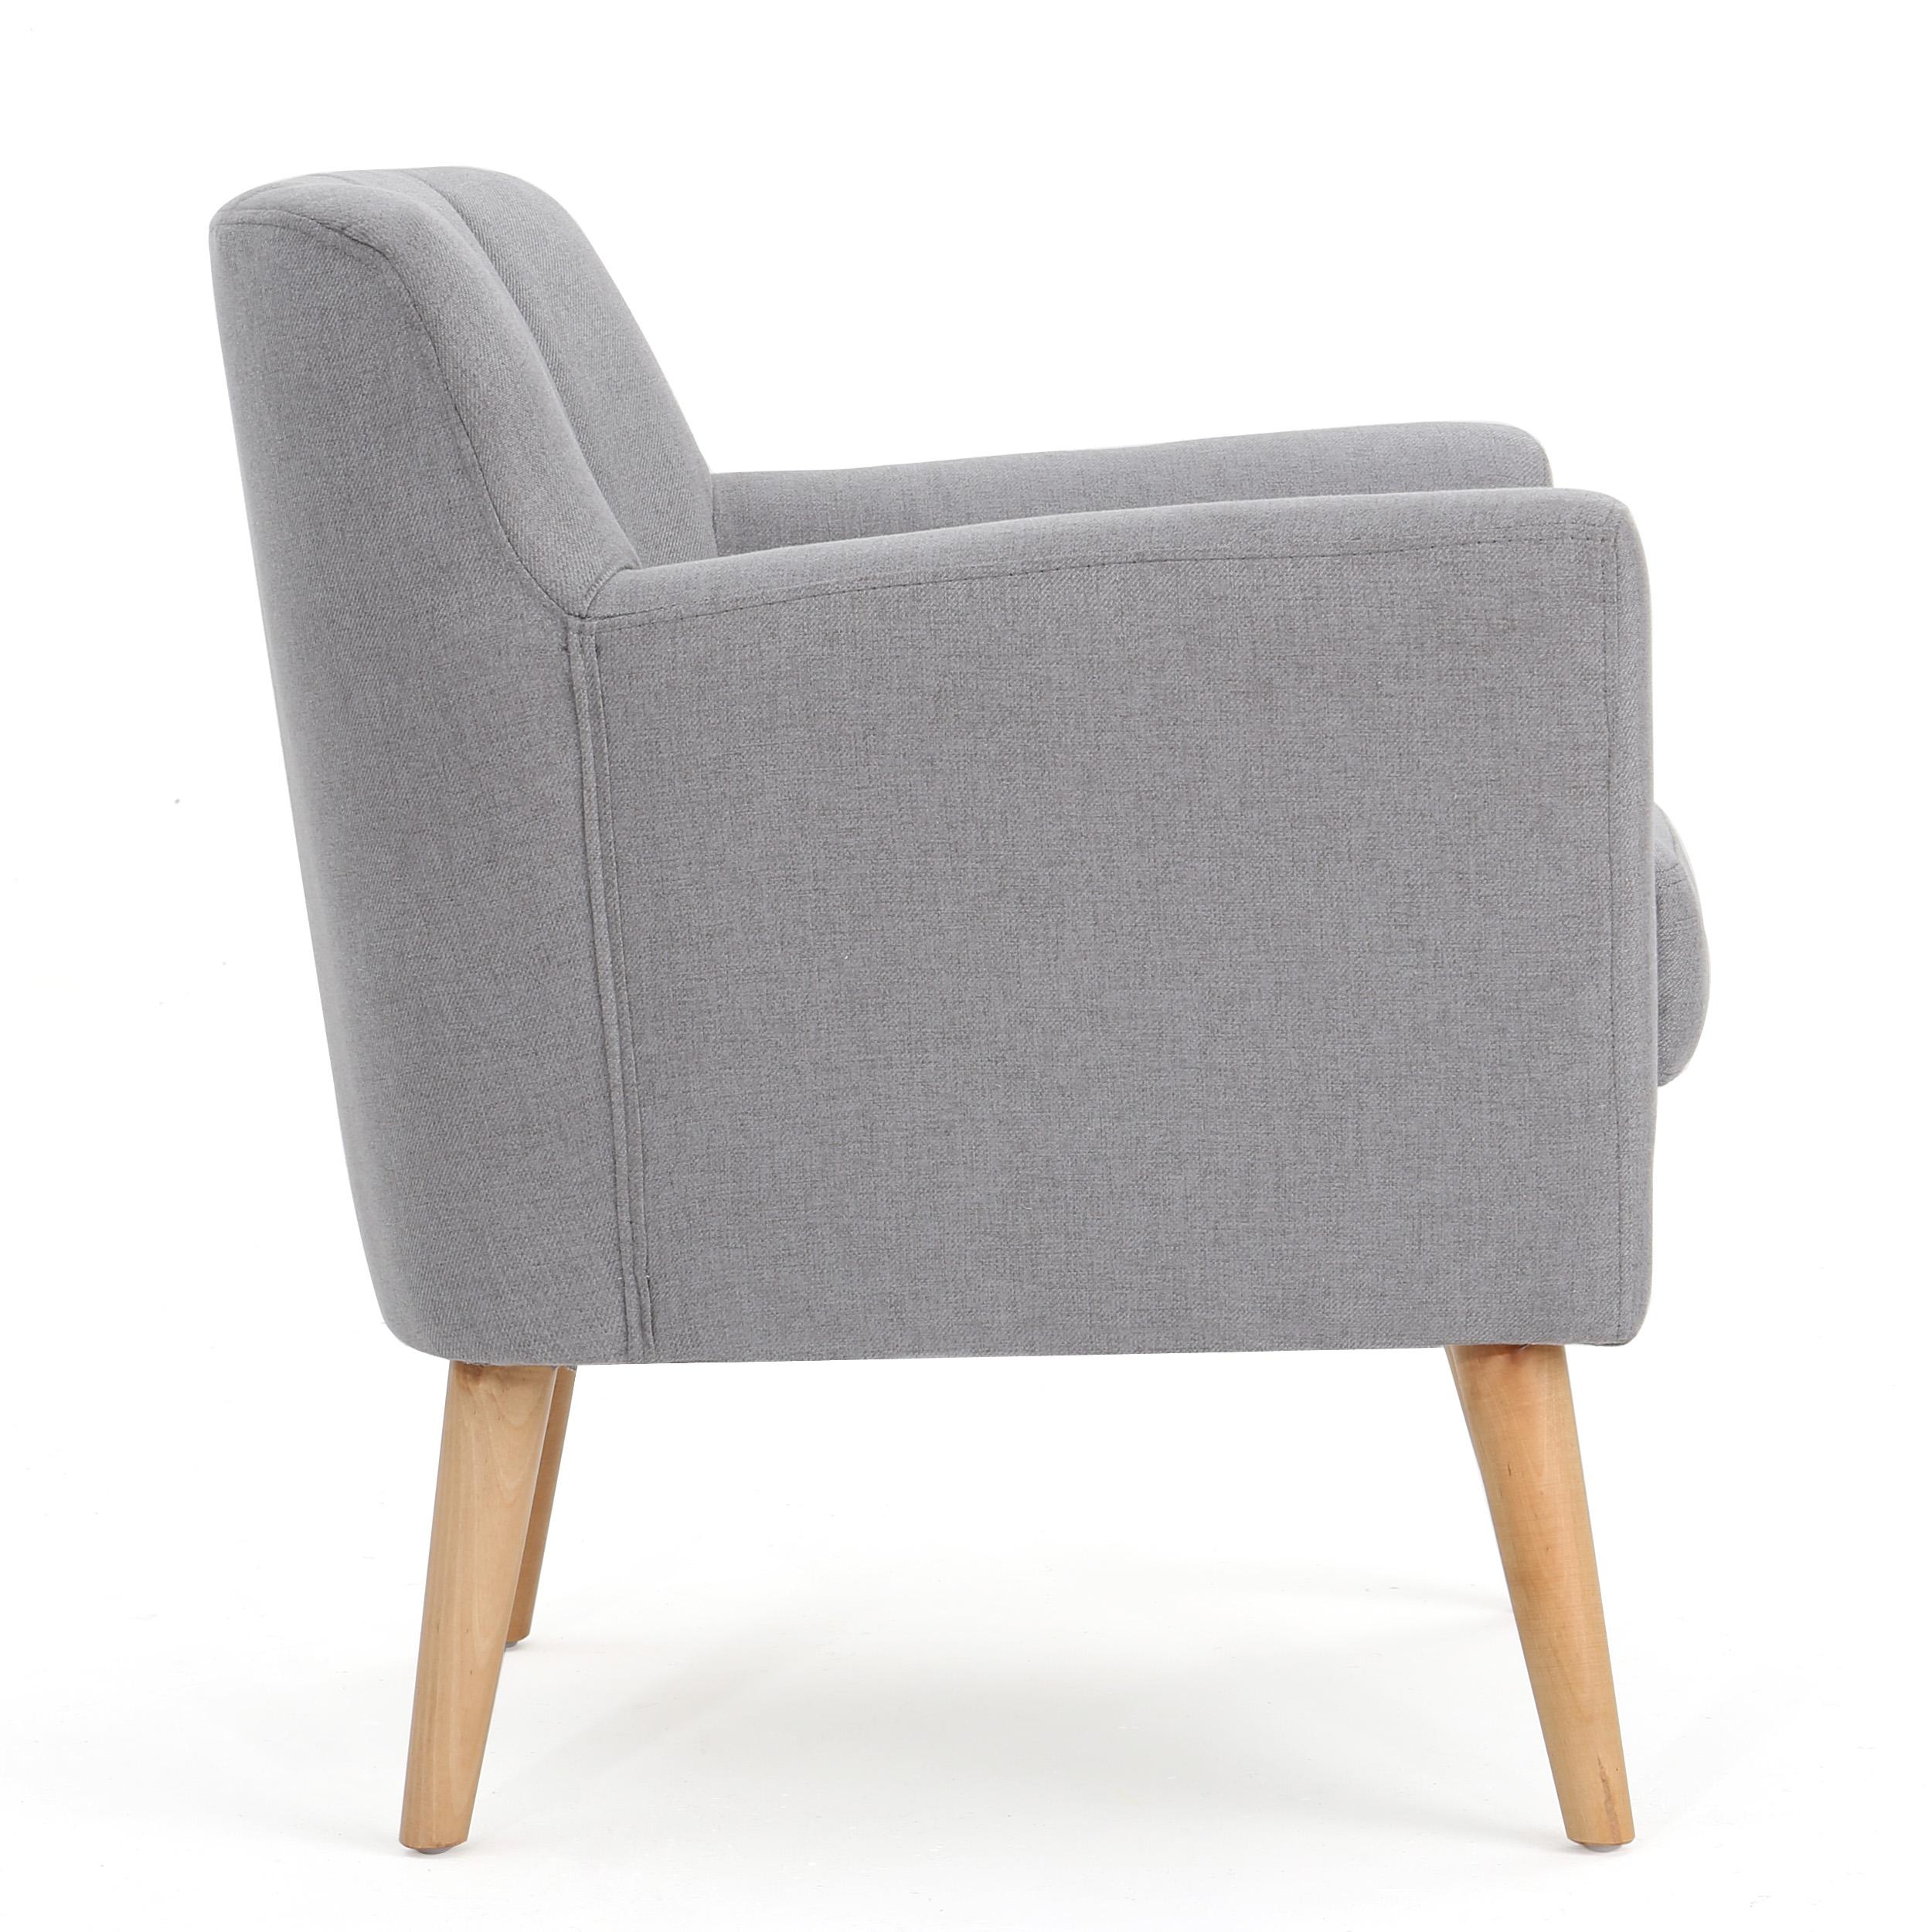 Admirable Madelyn Mid Century Modern Fabric Club Chair Ebay Machost Co Dining Chair Design Ideas Machostcouk